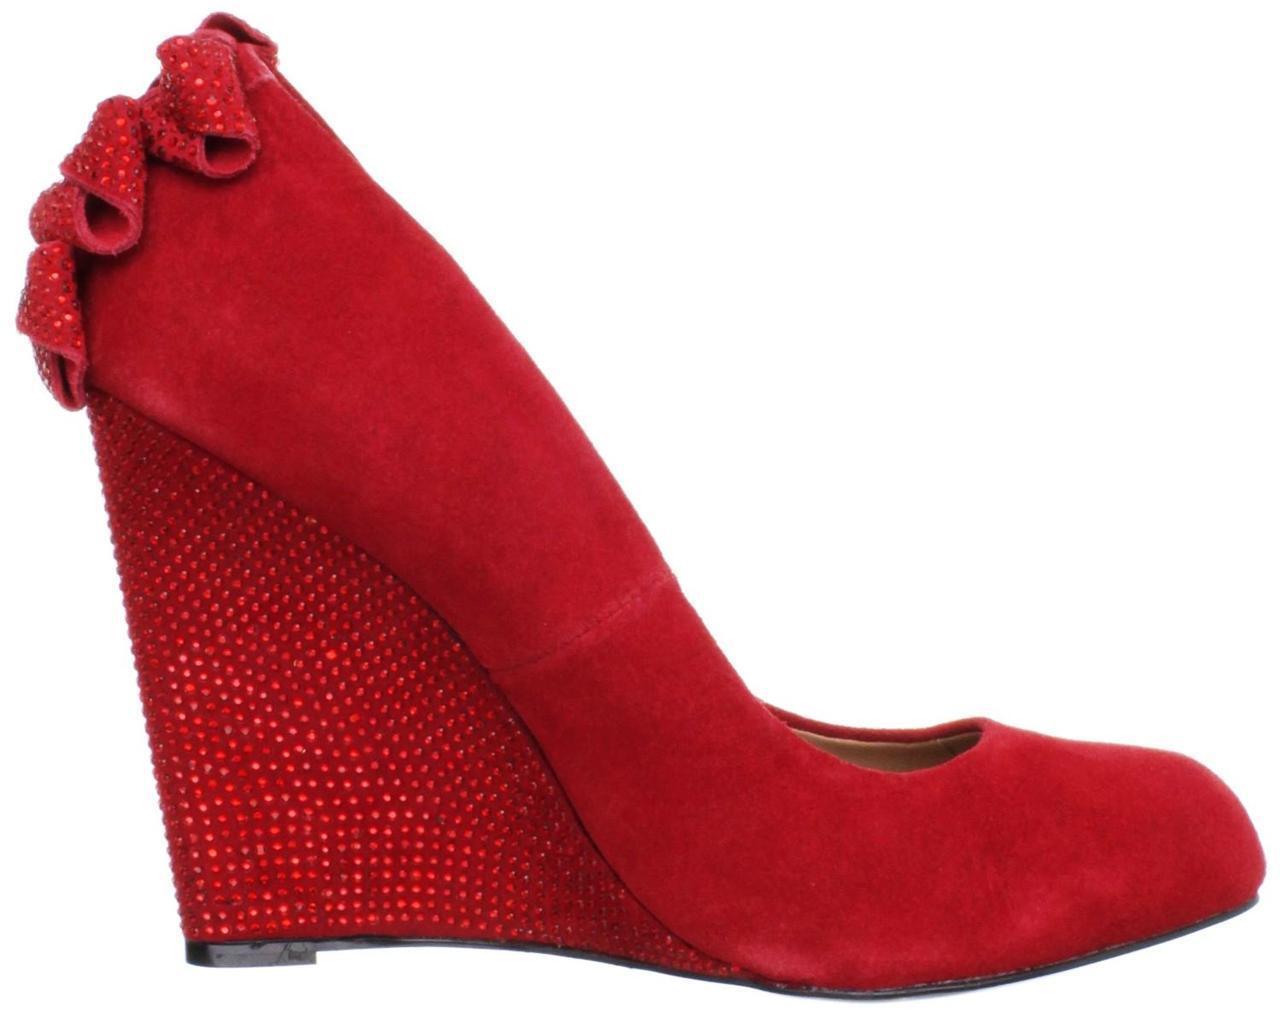 bellissima Donna    Betsey Johnson CHHASE Chase Platform Wedge Dress Pumps Heels rosso Suede  nuova esclusiva di fascia alta